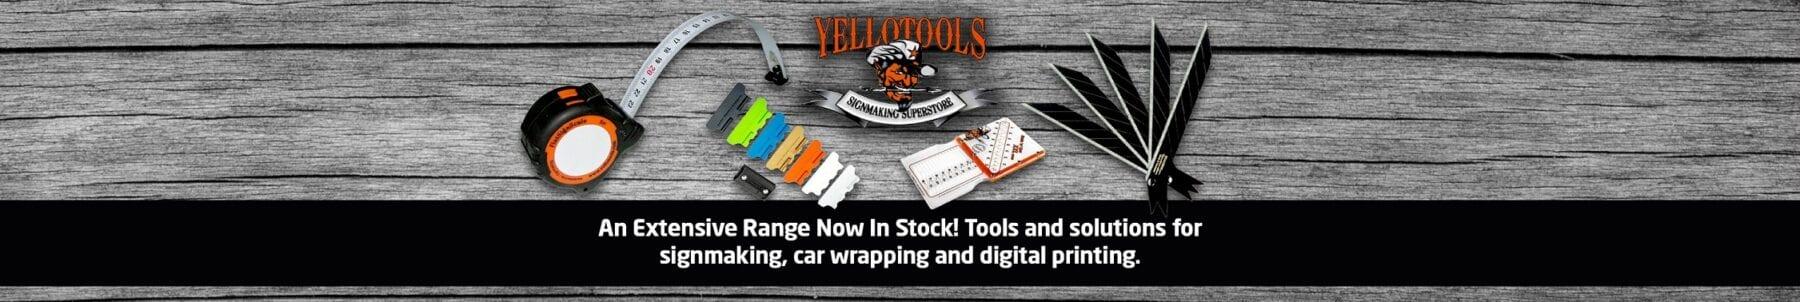 Yellotools Banner